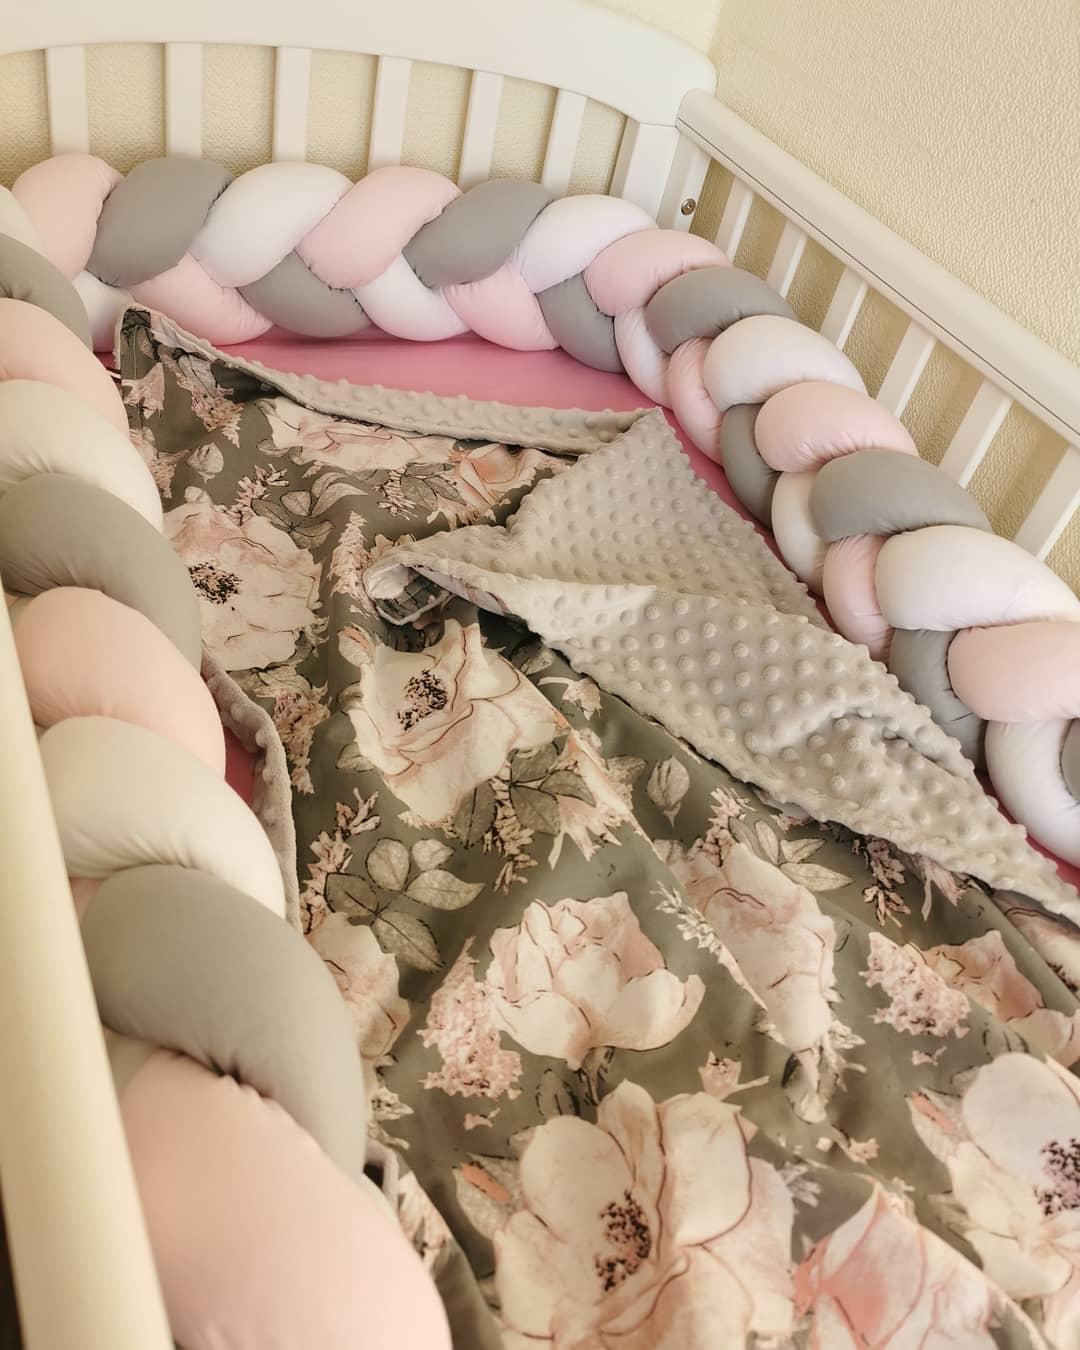 3M/2M/1M Newborn Baby Bed Bumper Protector Tour De Lit Bebe Tresse Crib Bumper Pillow Bed Bumper Baby Room Decor